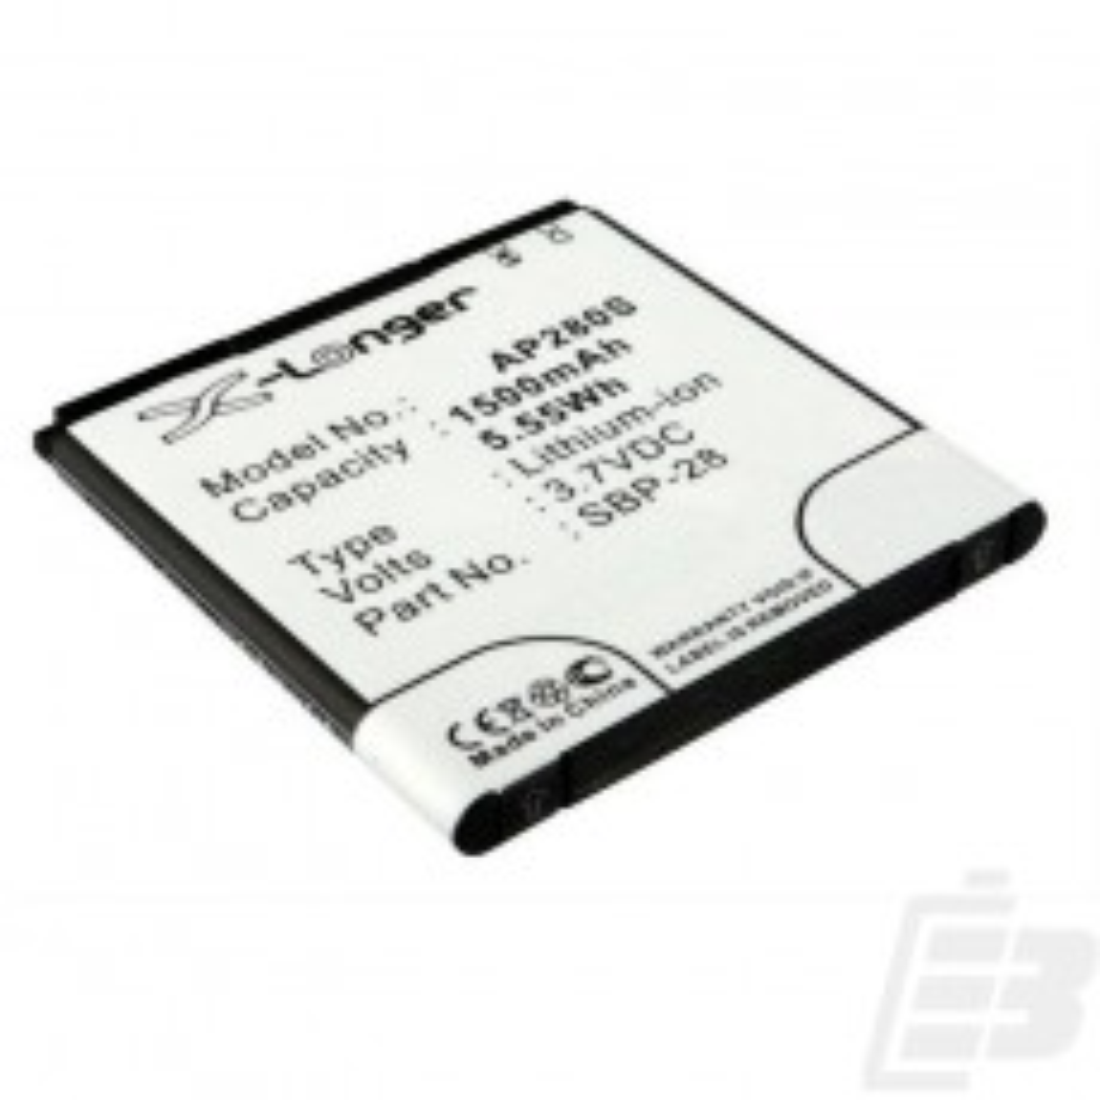 Smartphone battery Asus PadFone_1